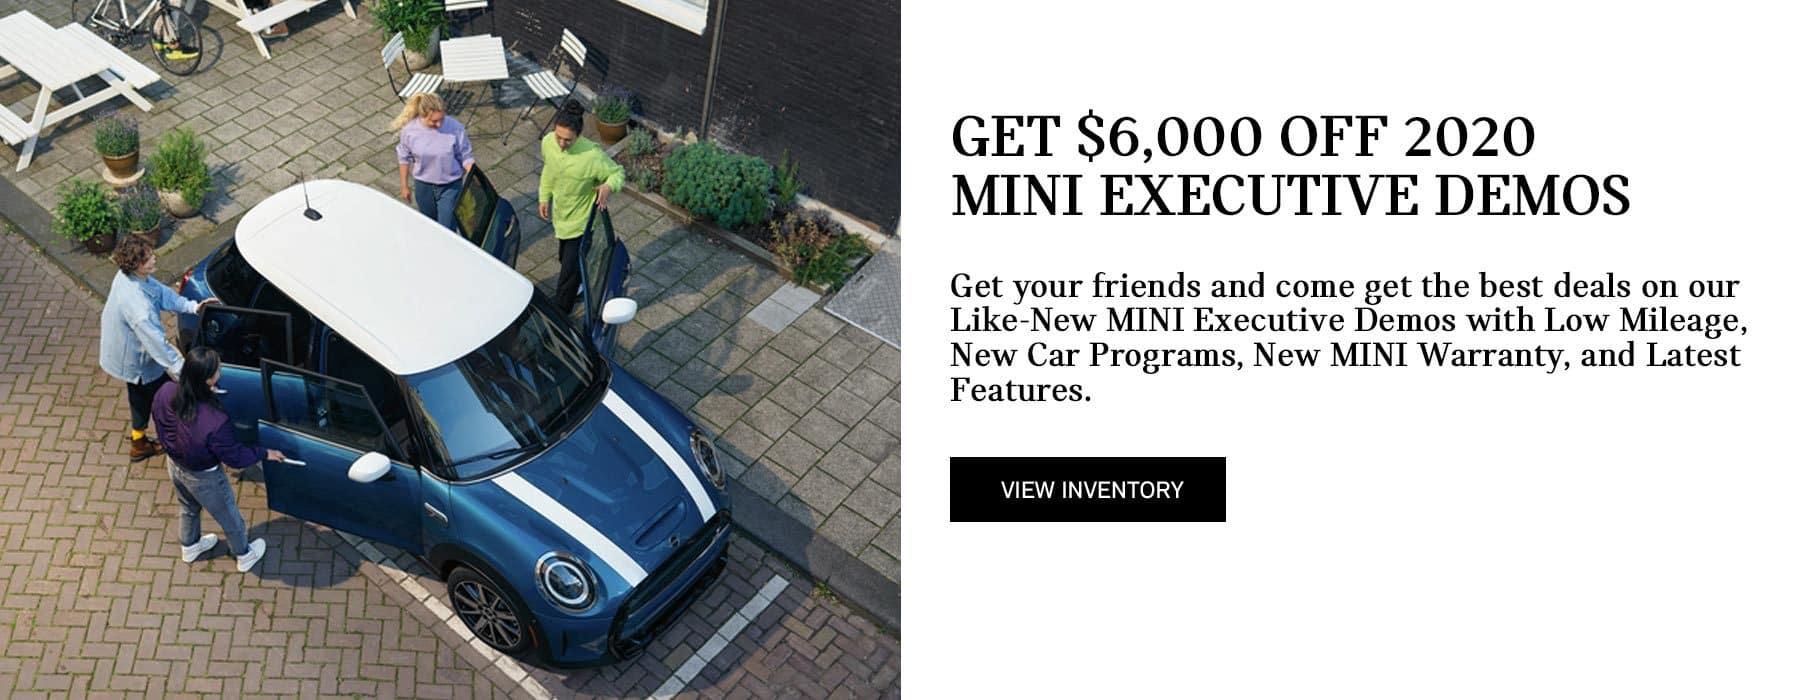 MINI-Executive-Demos